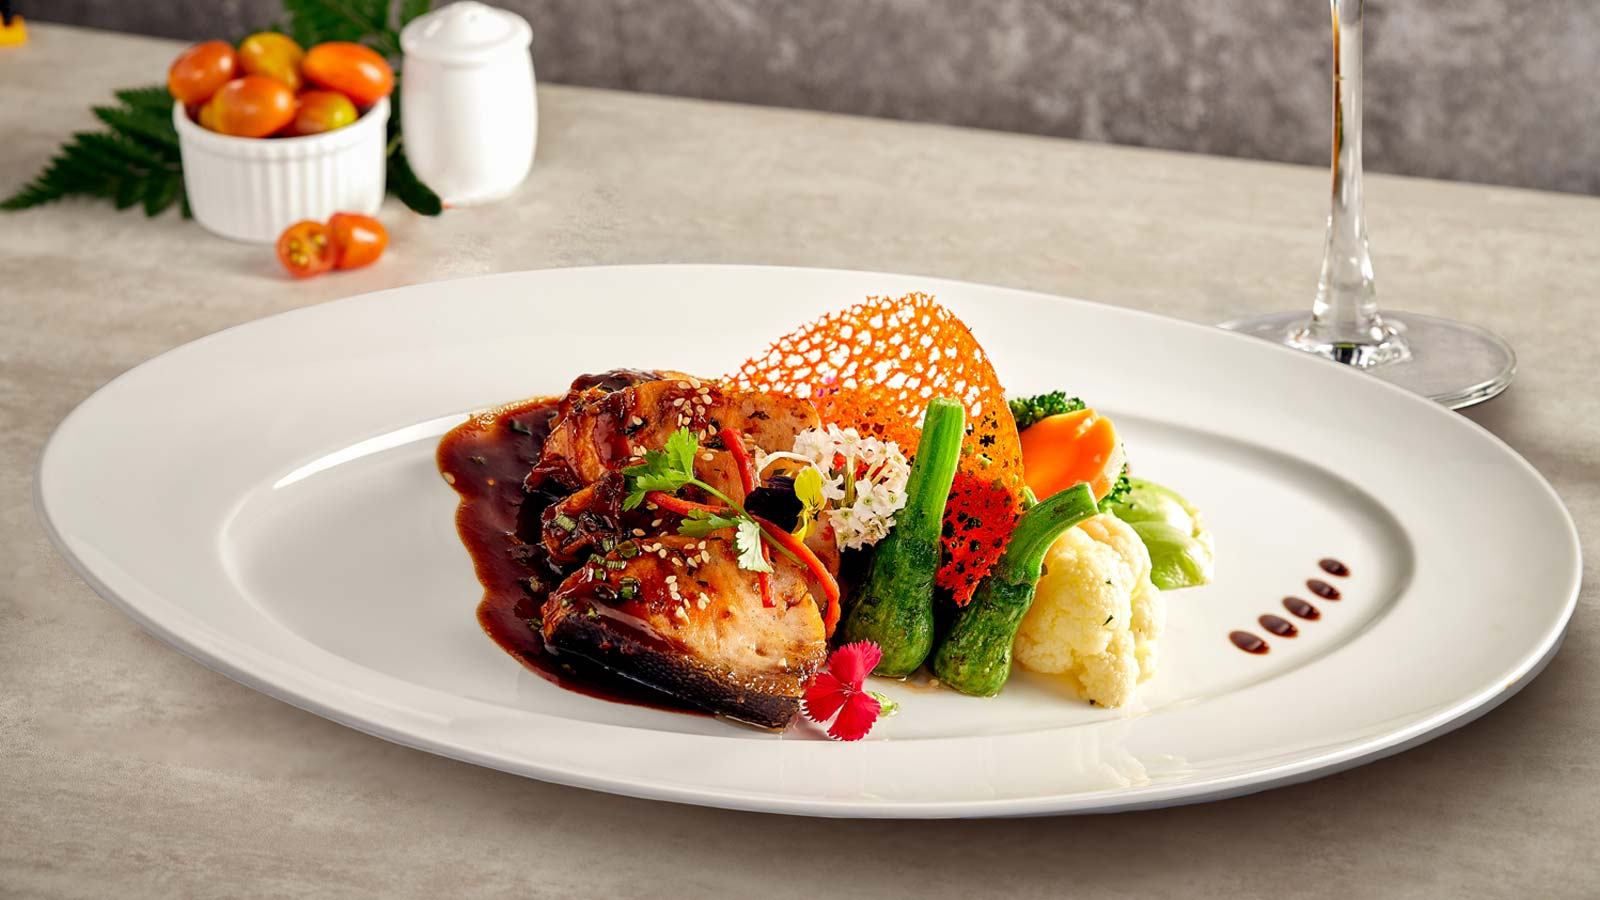 Dinner Lunch and Dinner2